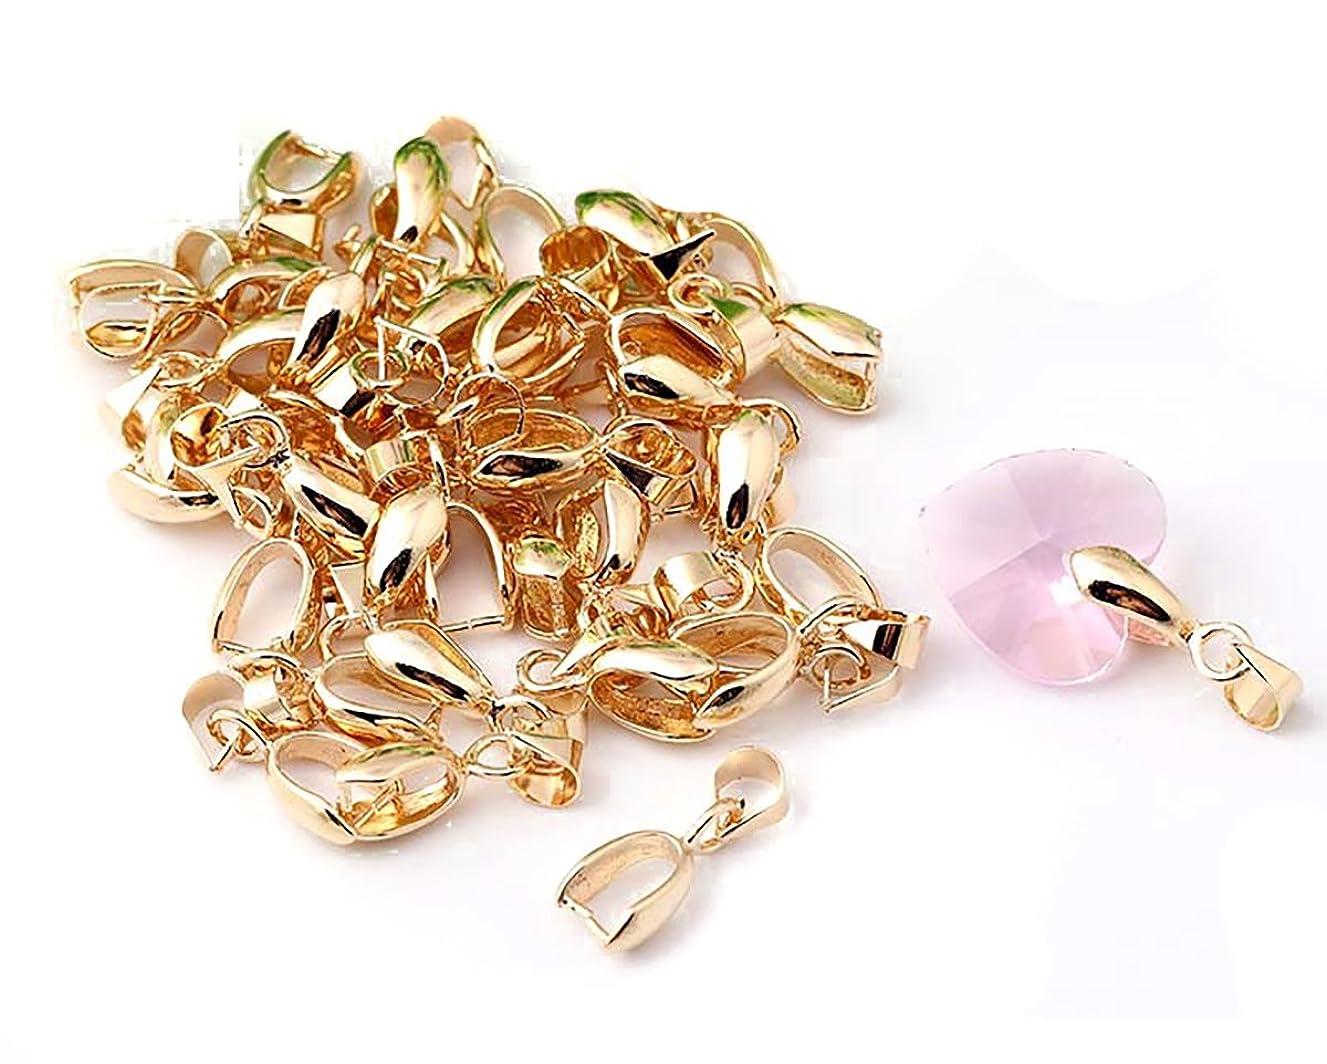 50 Pcs Copper Pinch Clip Clasp Bails Dangle Metal DIY Jewelry Findings Pendant Bail Bead Pendant Connector Necklace Clasps (KC Gold, 6 x 17mm)